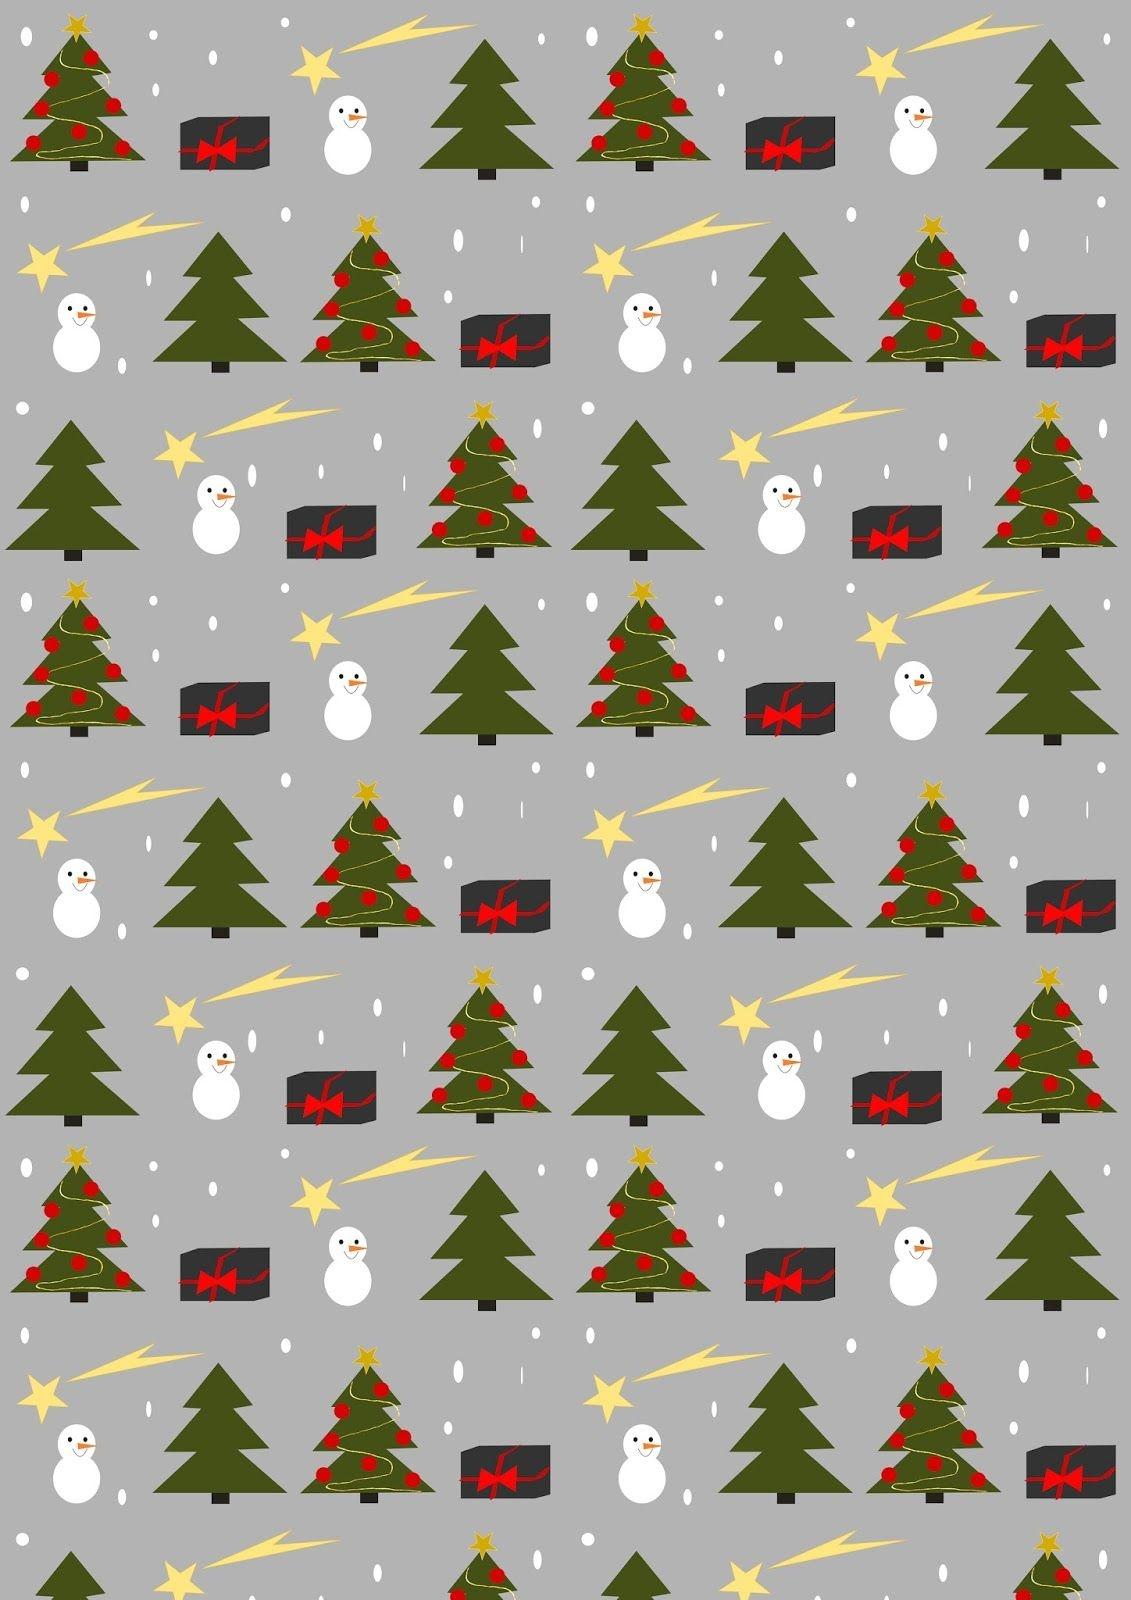 Free Printable Christmas Joy Wrapping Paper - Ausdruckbares - Free Printable Christmas Paper